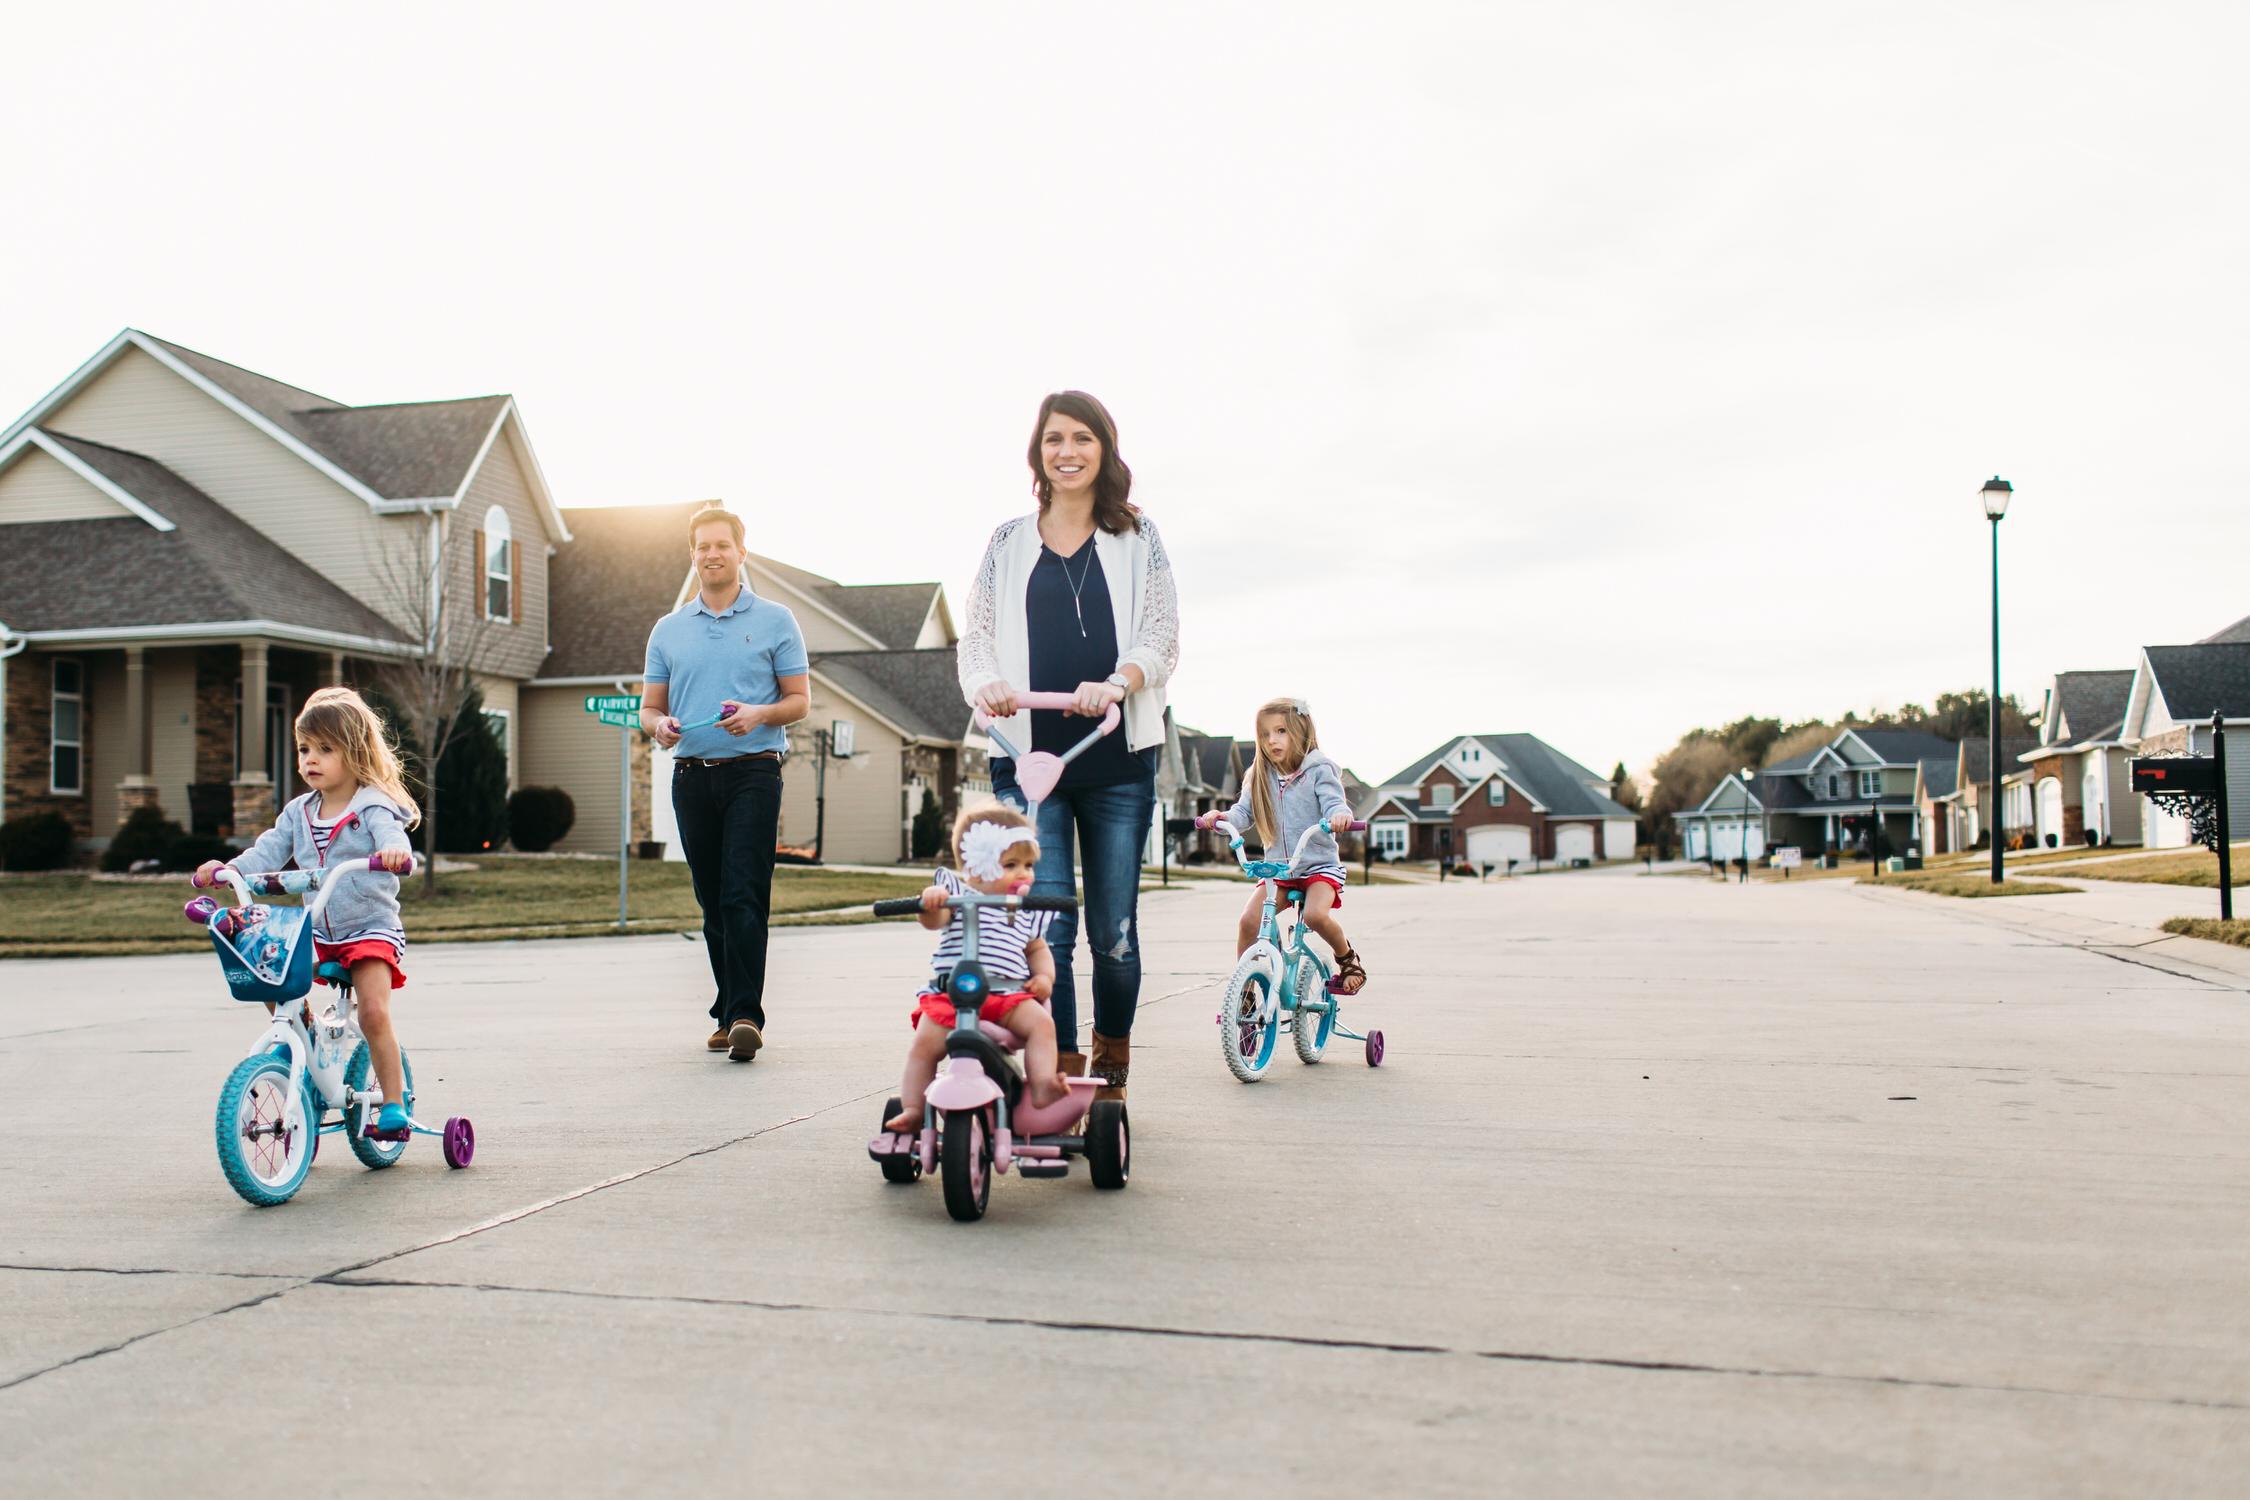 Family photos in the suburbs, Lifestyle family photos,